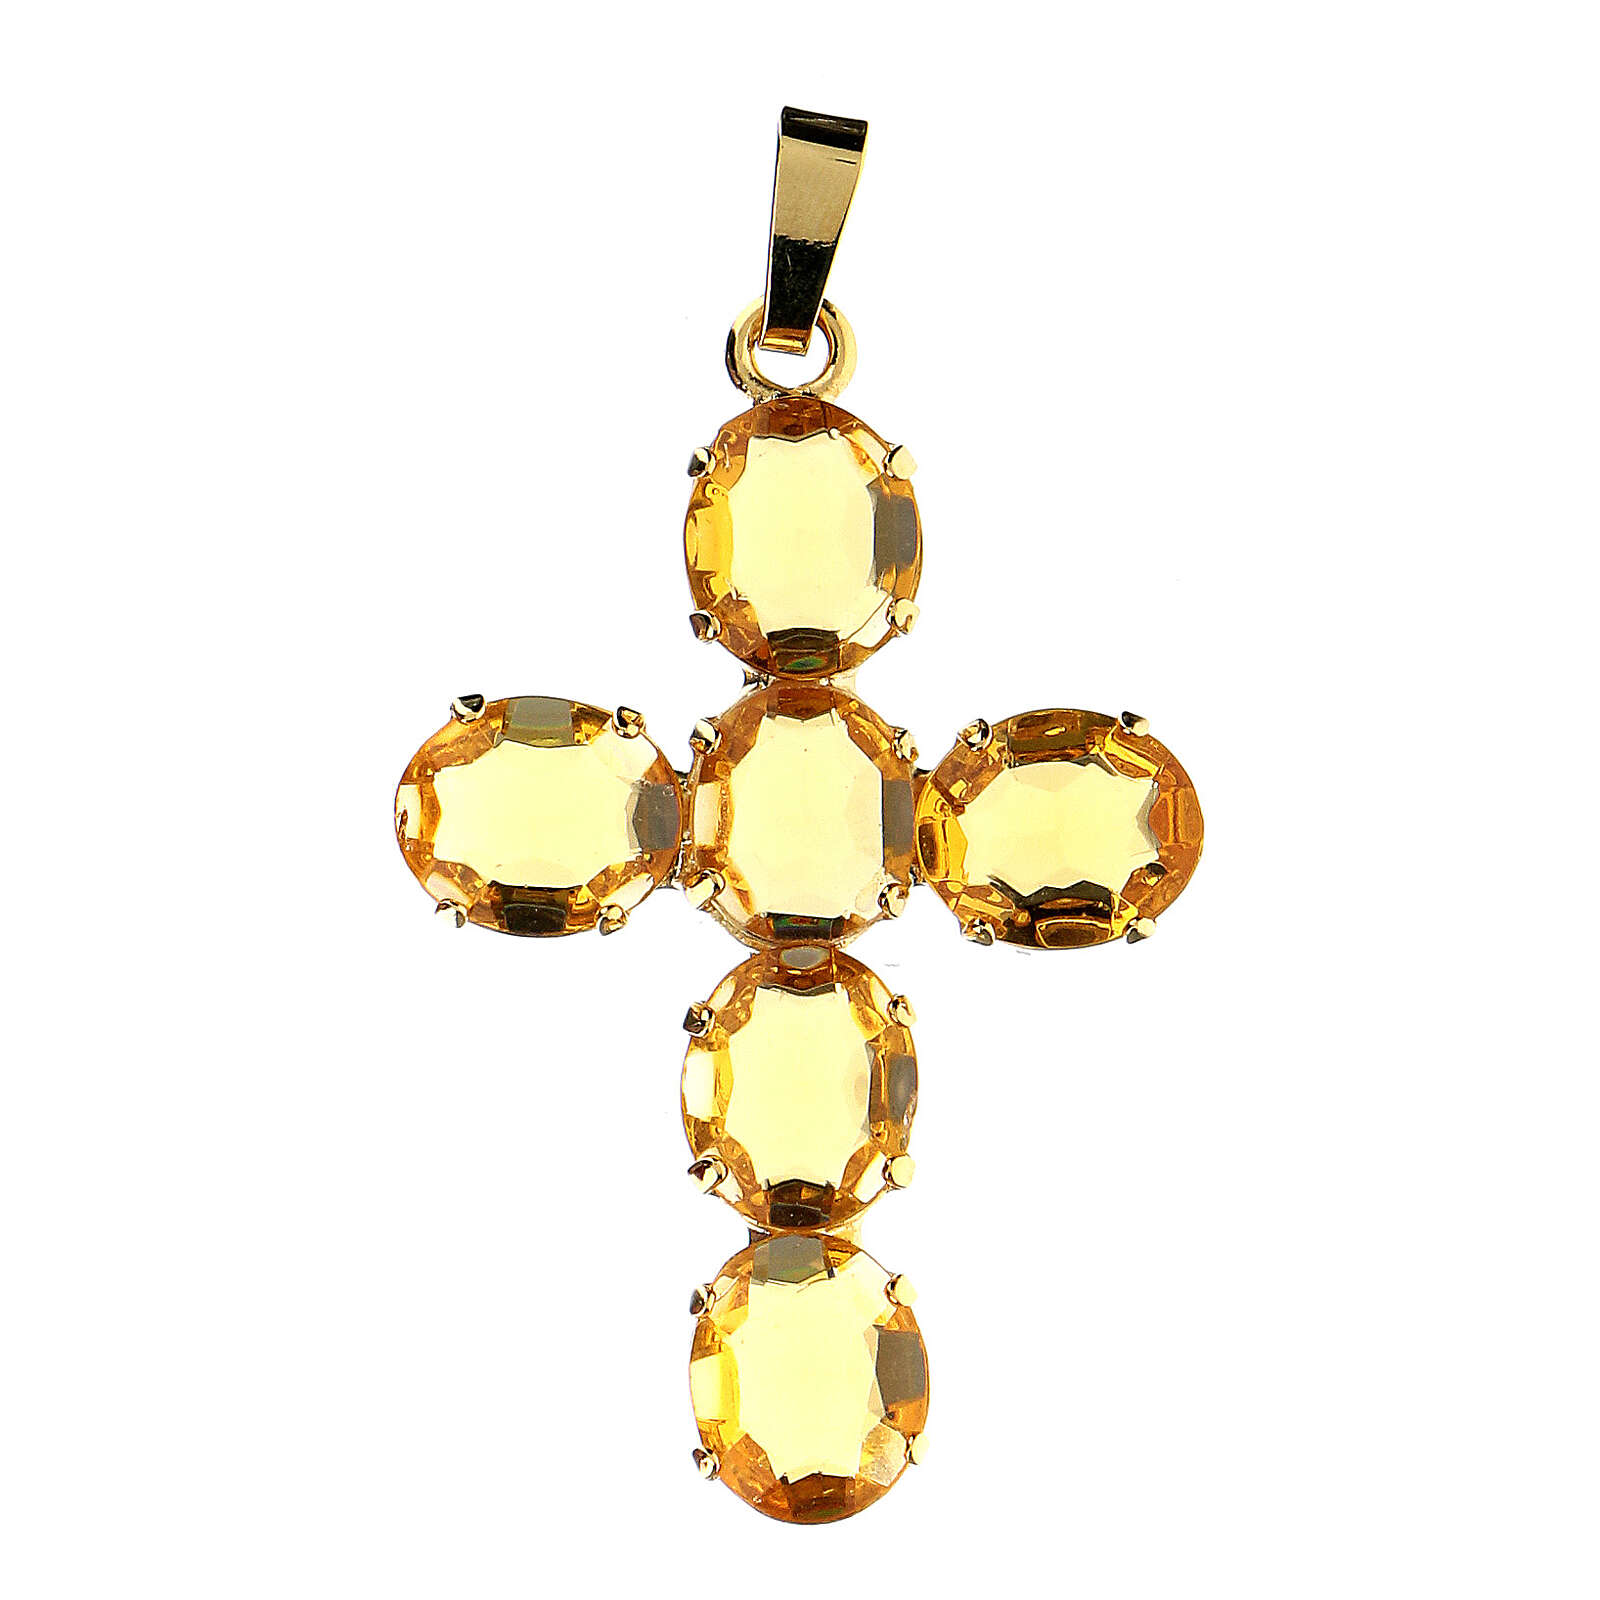 Croce pendente cristallo giallo ovale 4